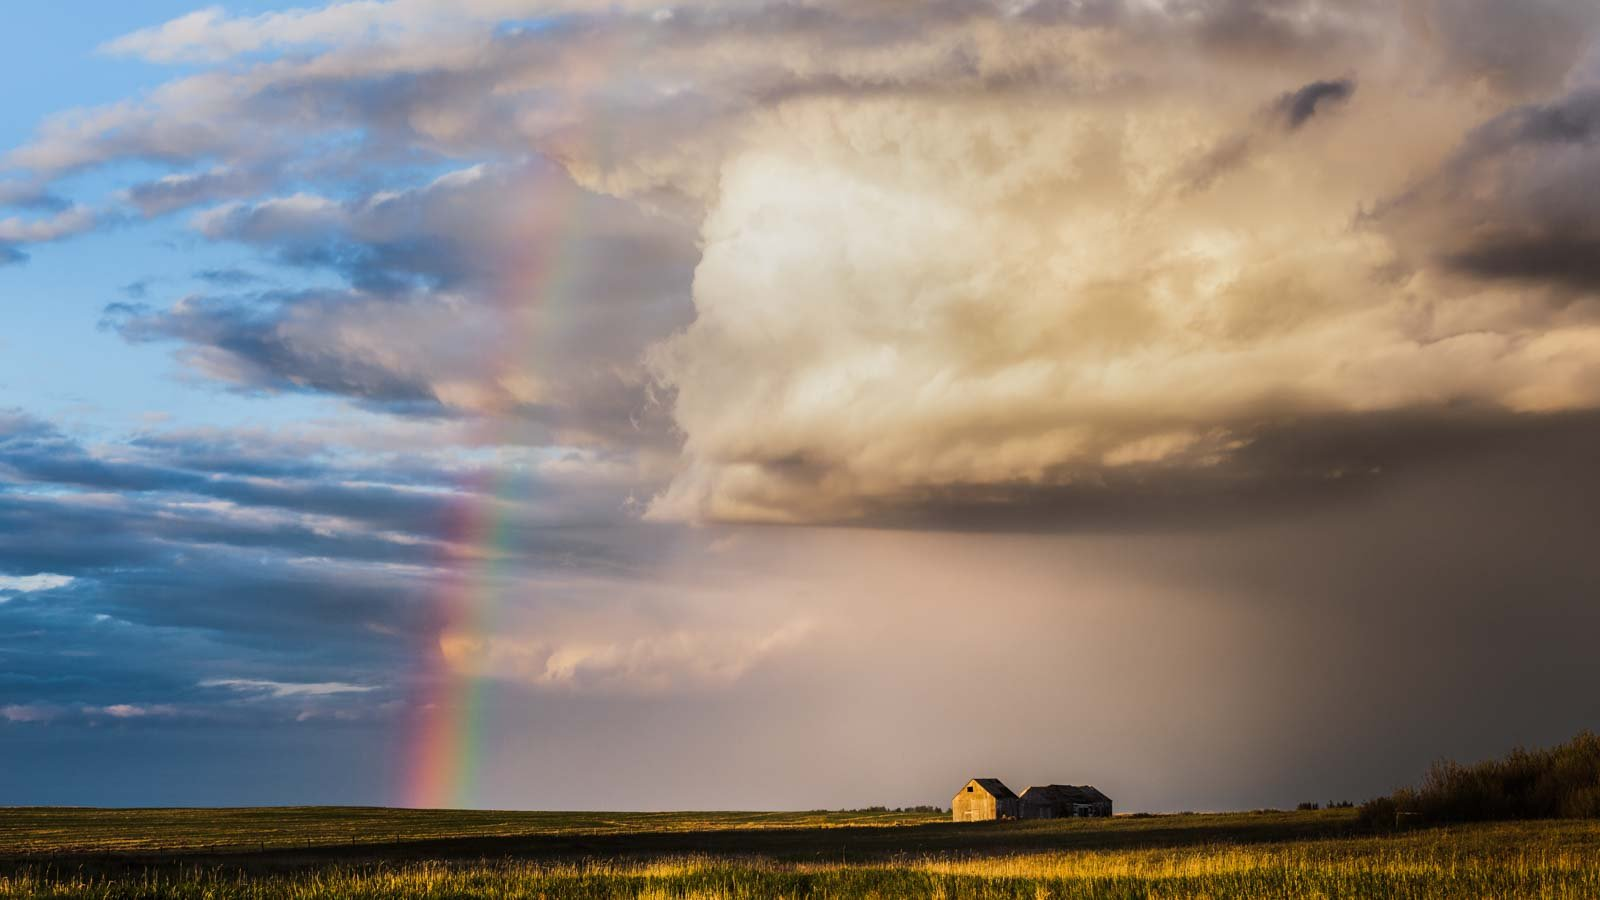 Incredible sky photo by Lori, taken during bad weather.